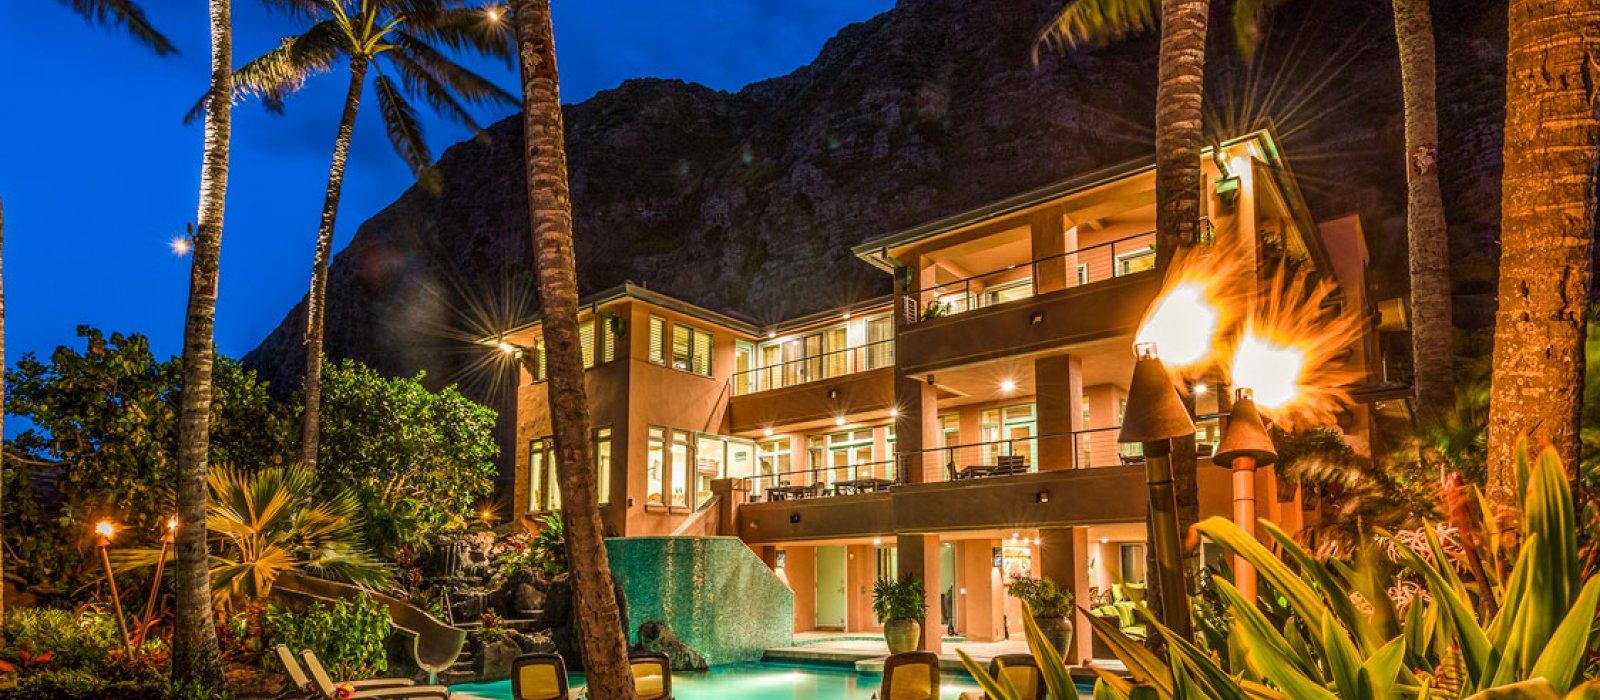 Royal Hawaiian Estate Waimanalo Vacation Villa